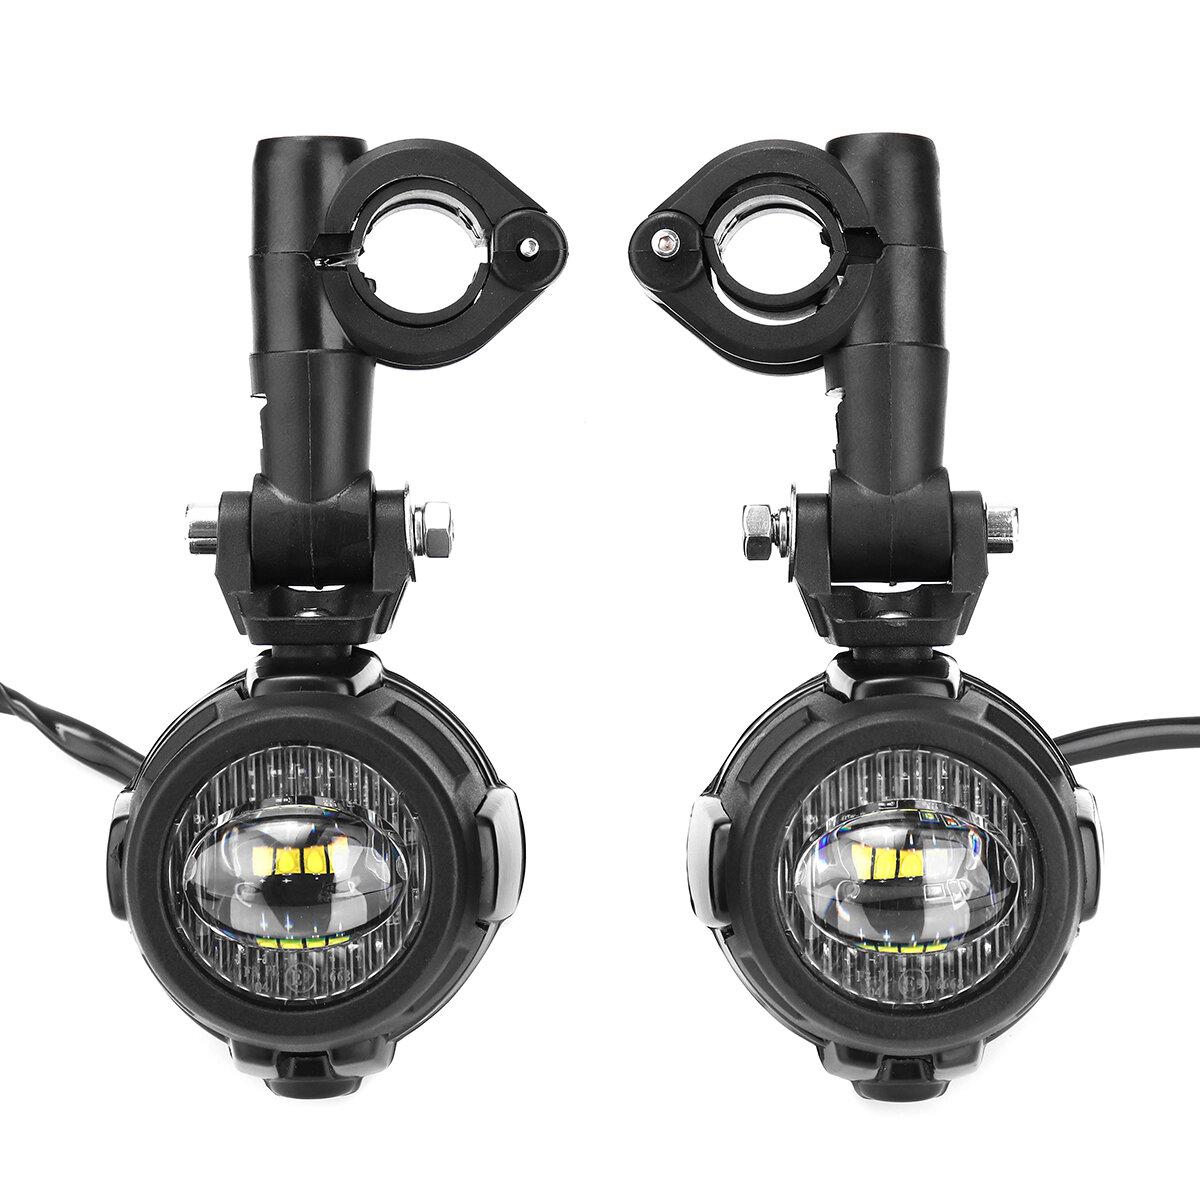 Universal Motorcycle Angel Eye LED Headlight Running Light Hi / Lo Beam - 3